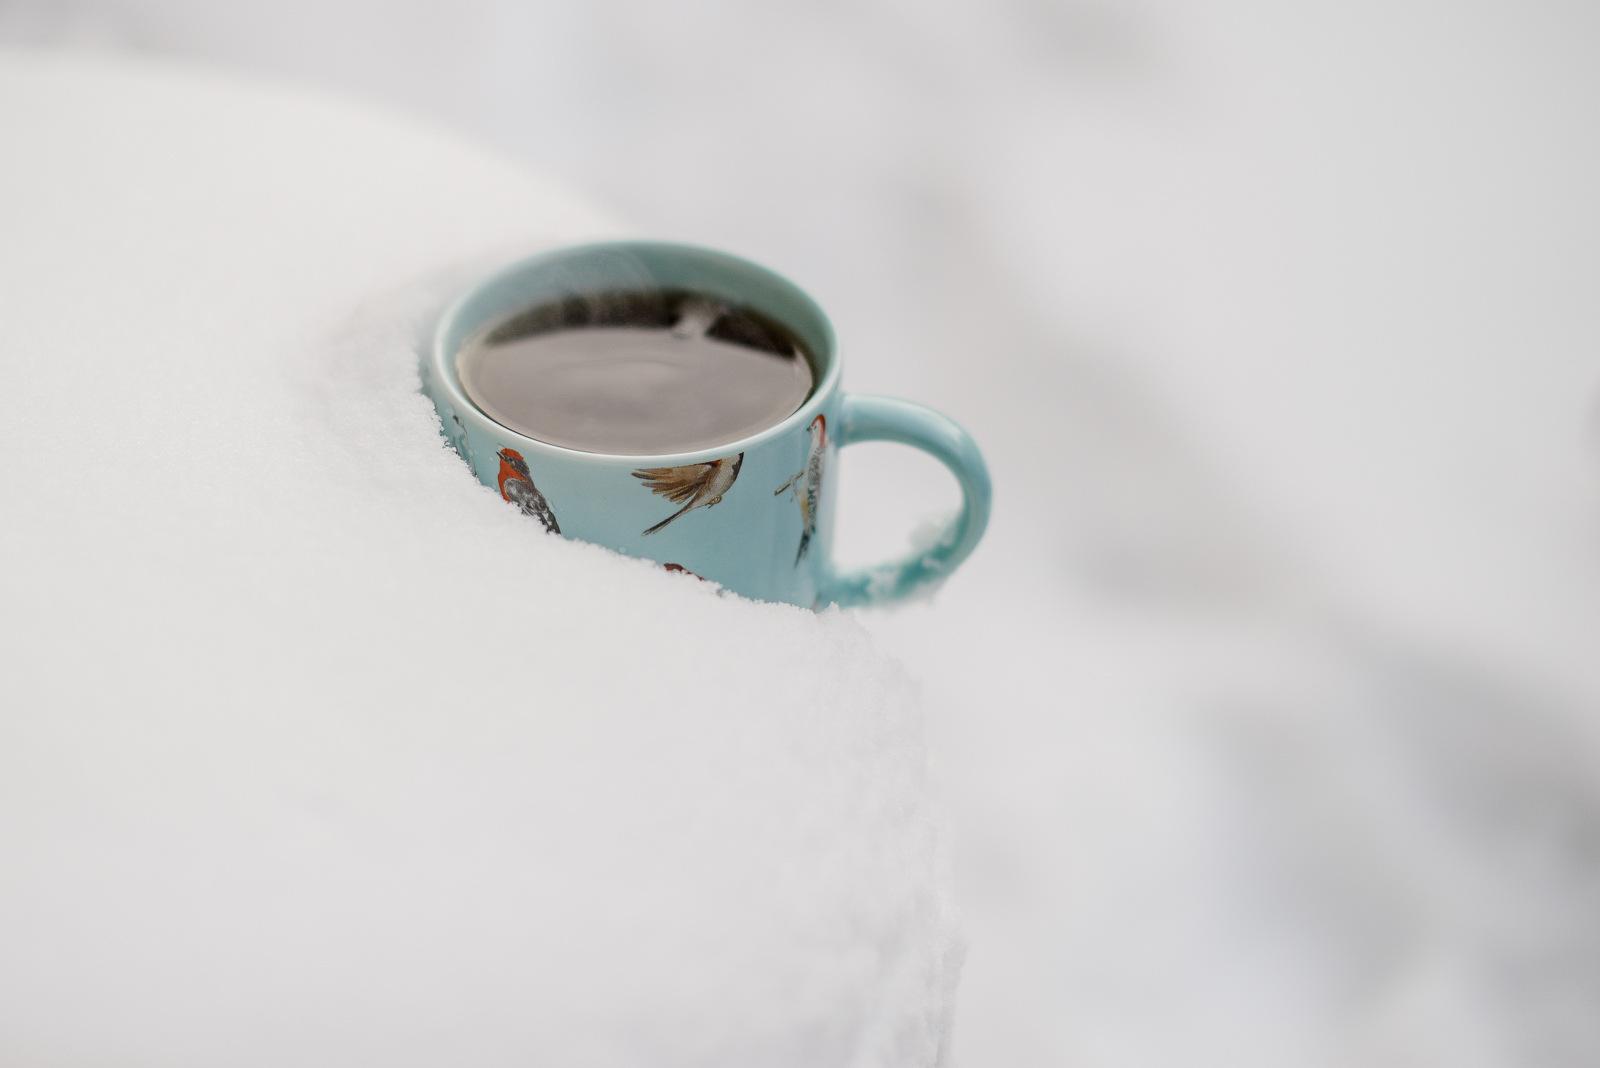 blue mug in snow